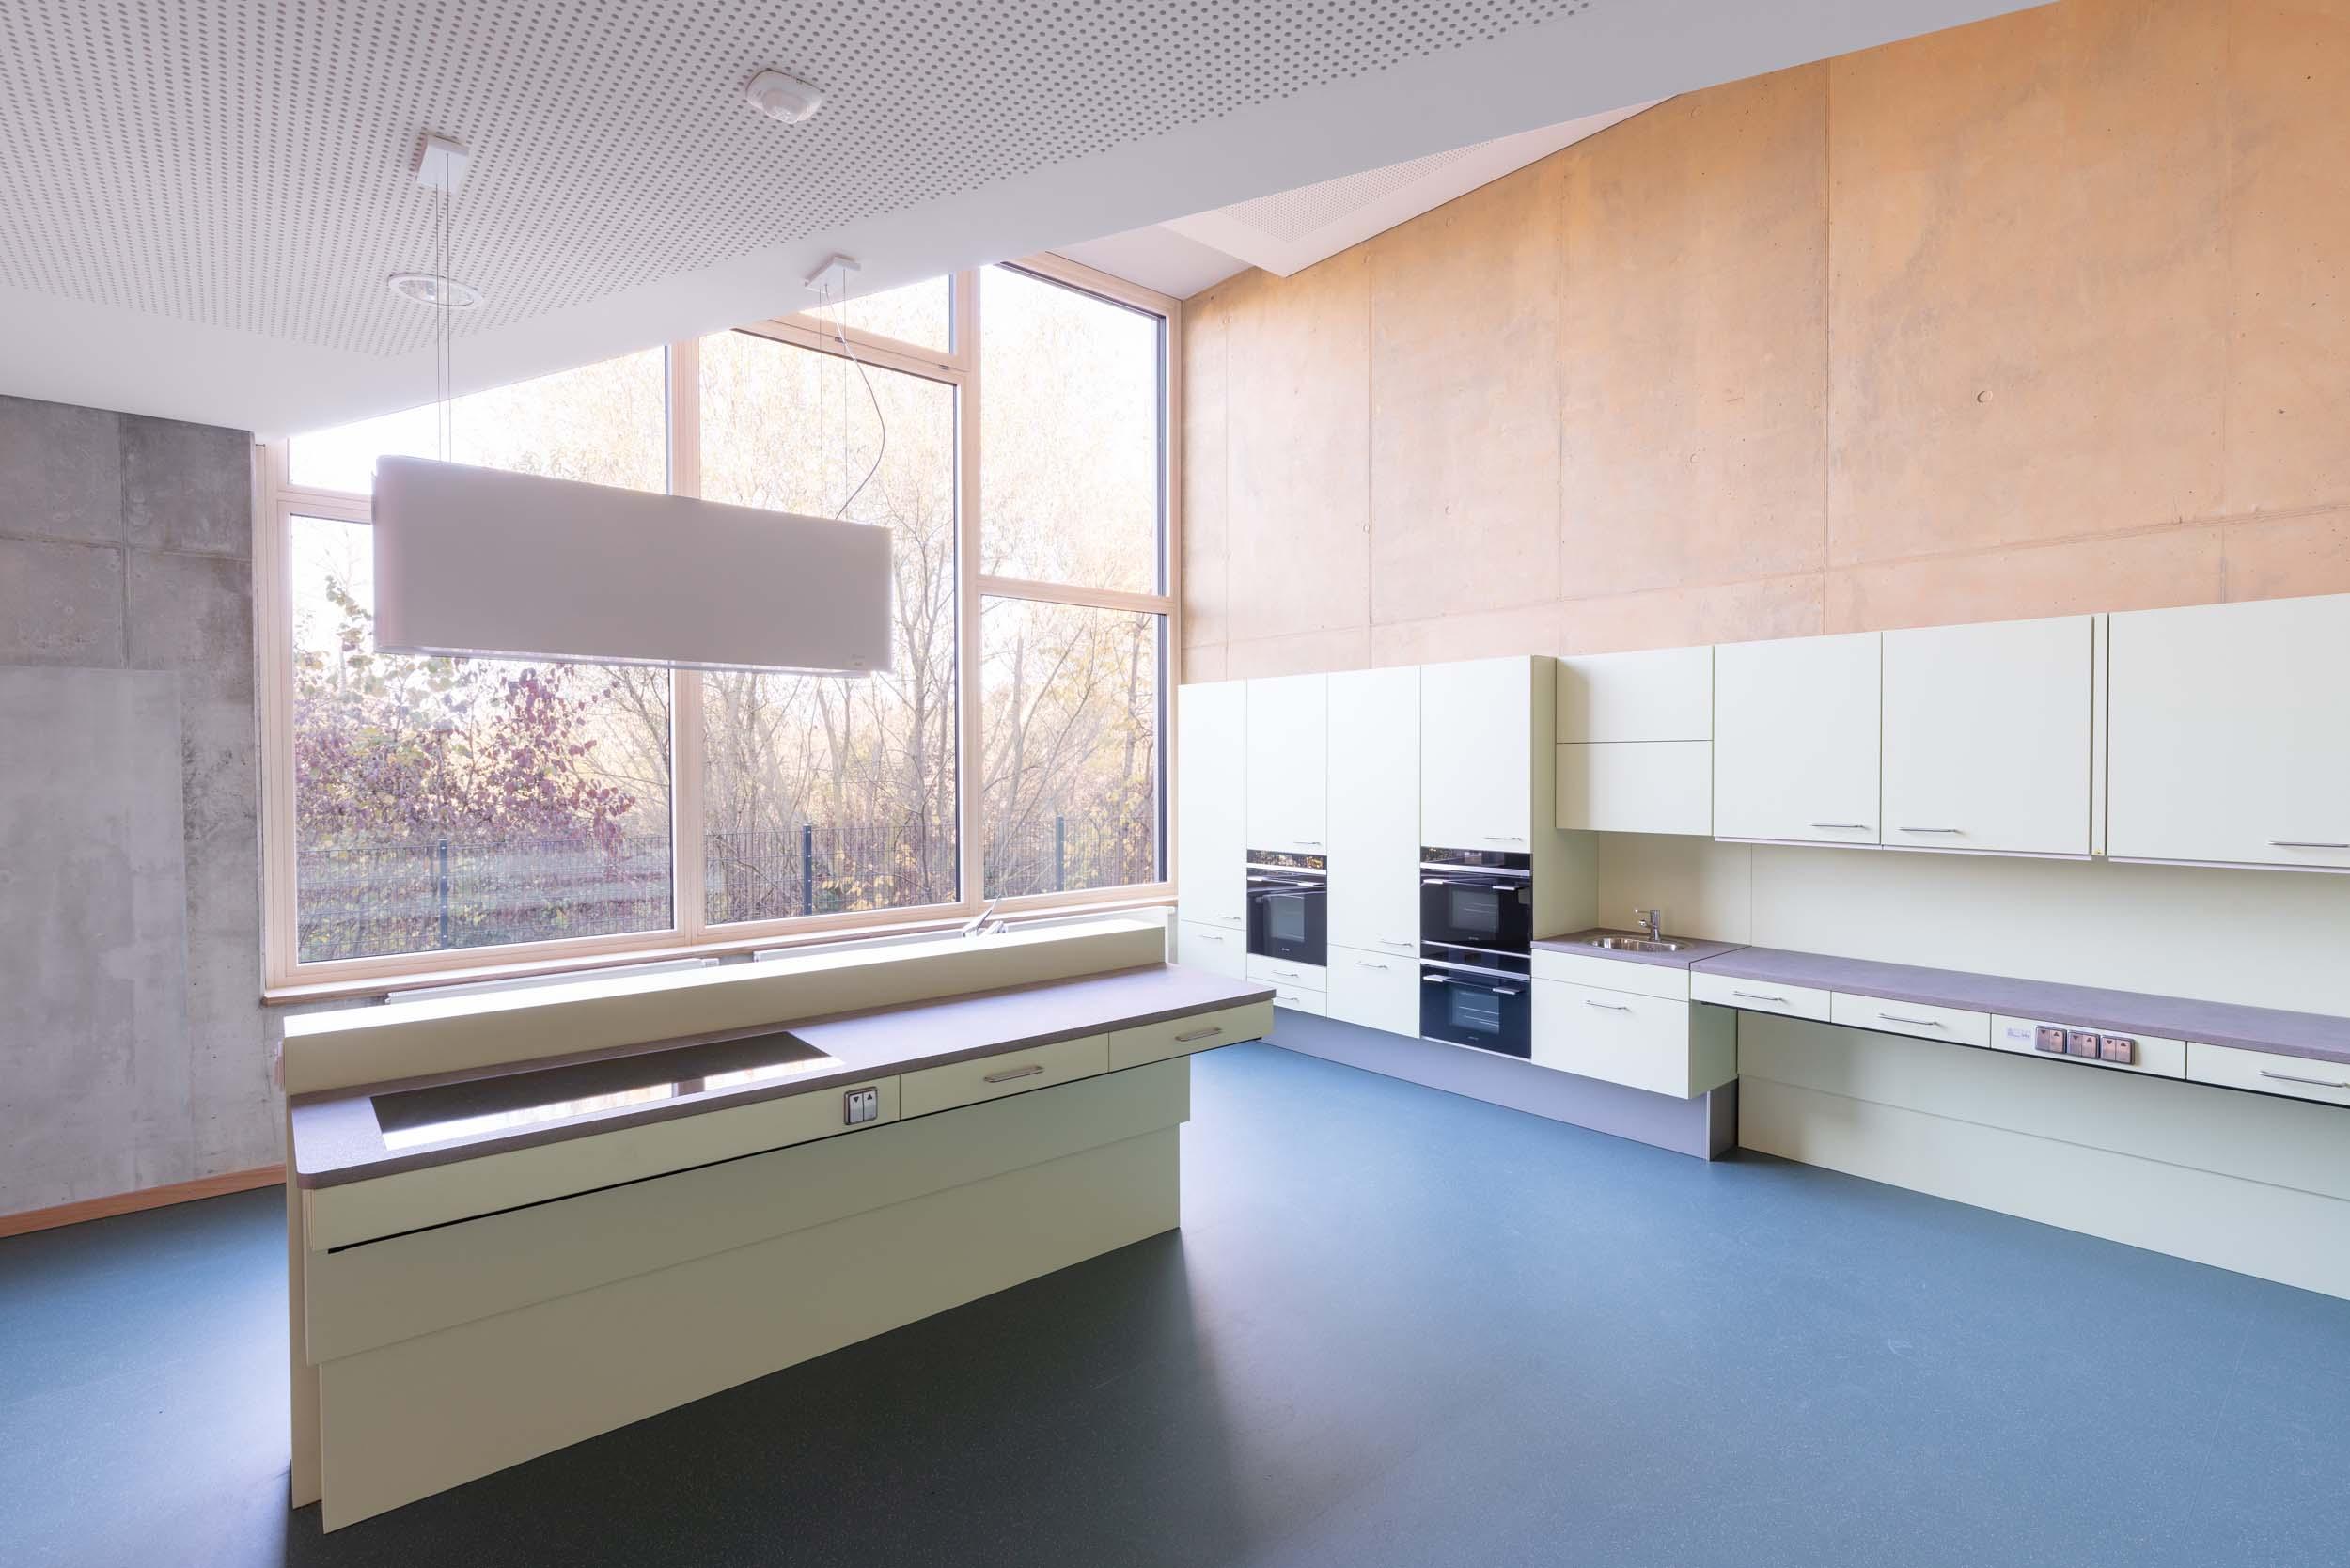 Hans Thoma Schule Oberursel Küche